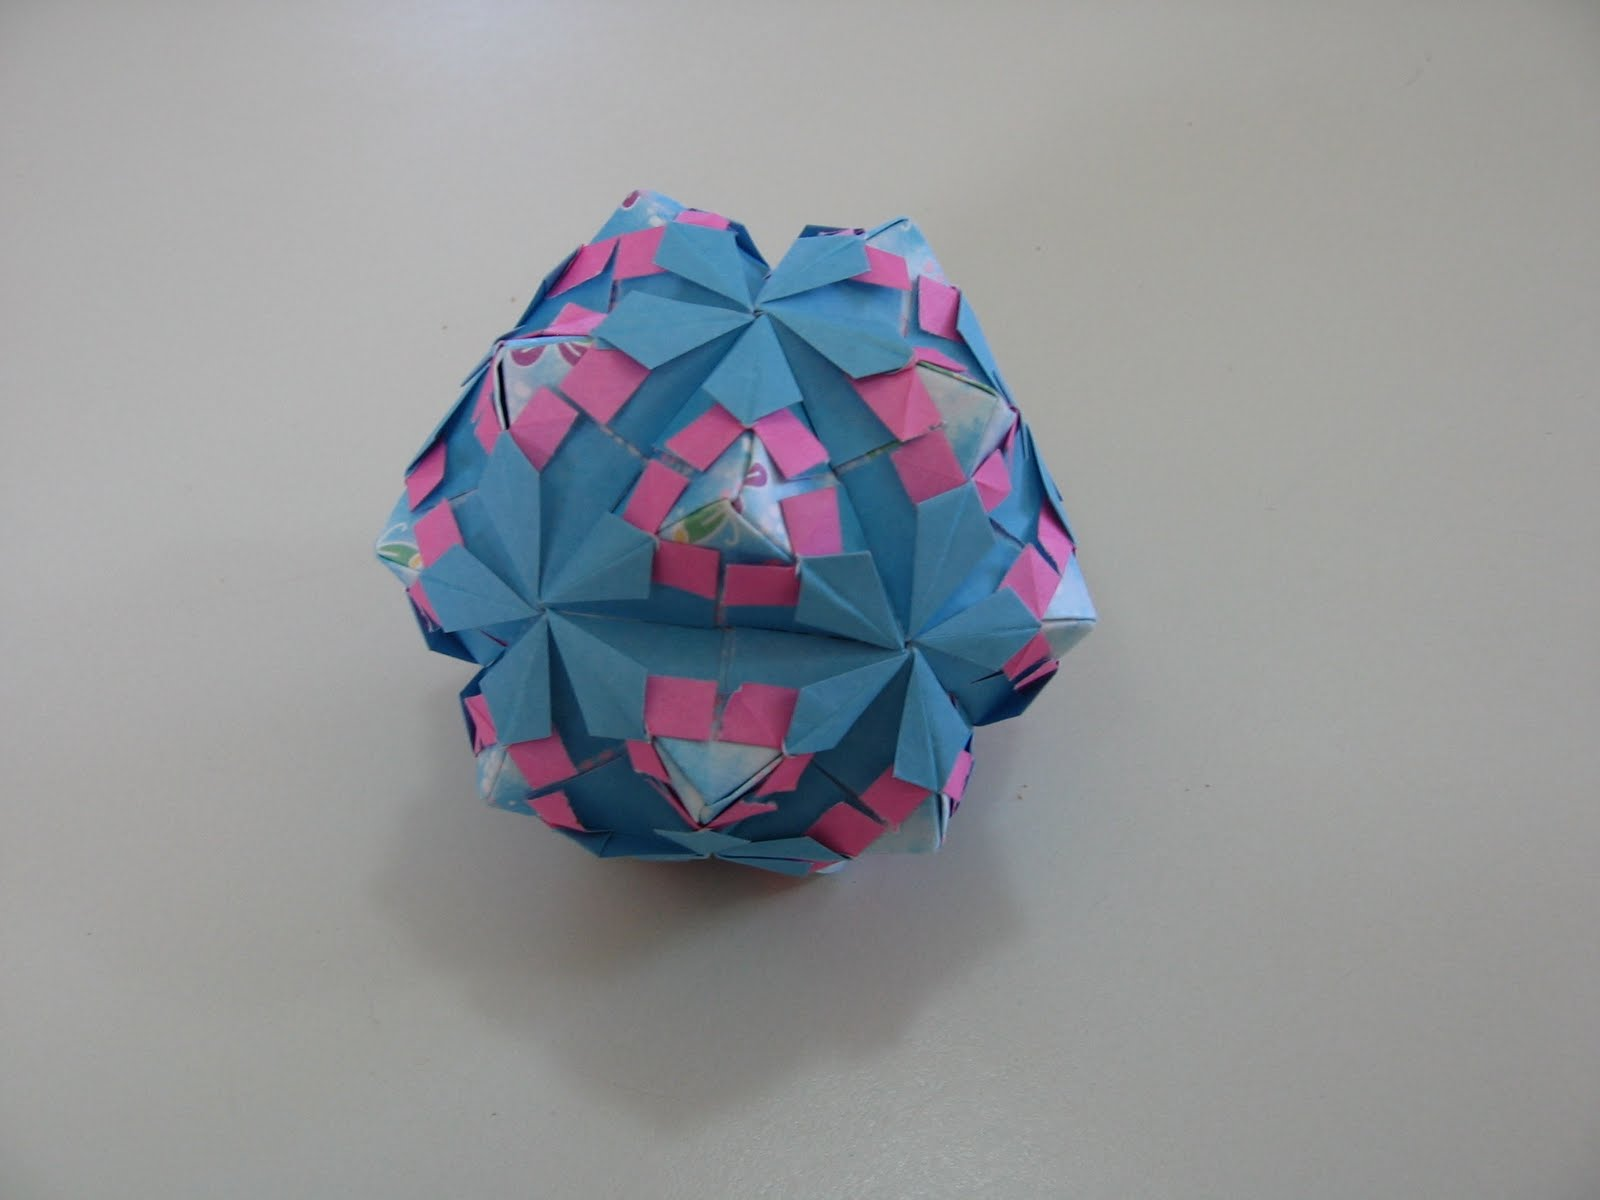 tomoko fuse origami embroidery origami. Black Bedroom Furniture Sets. Home Design Ideas